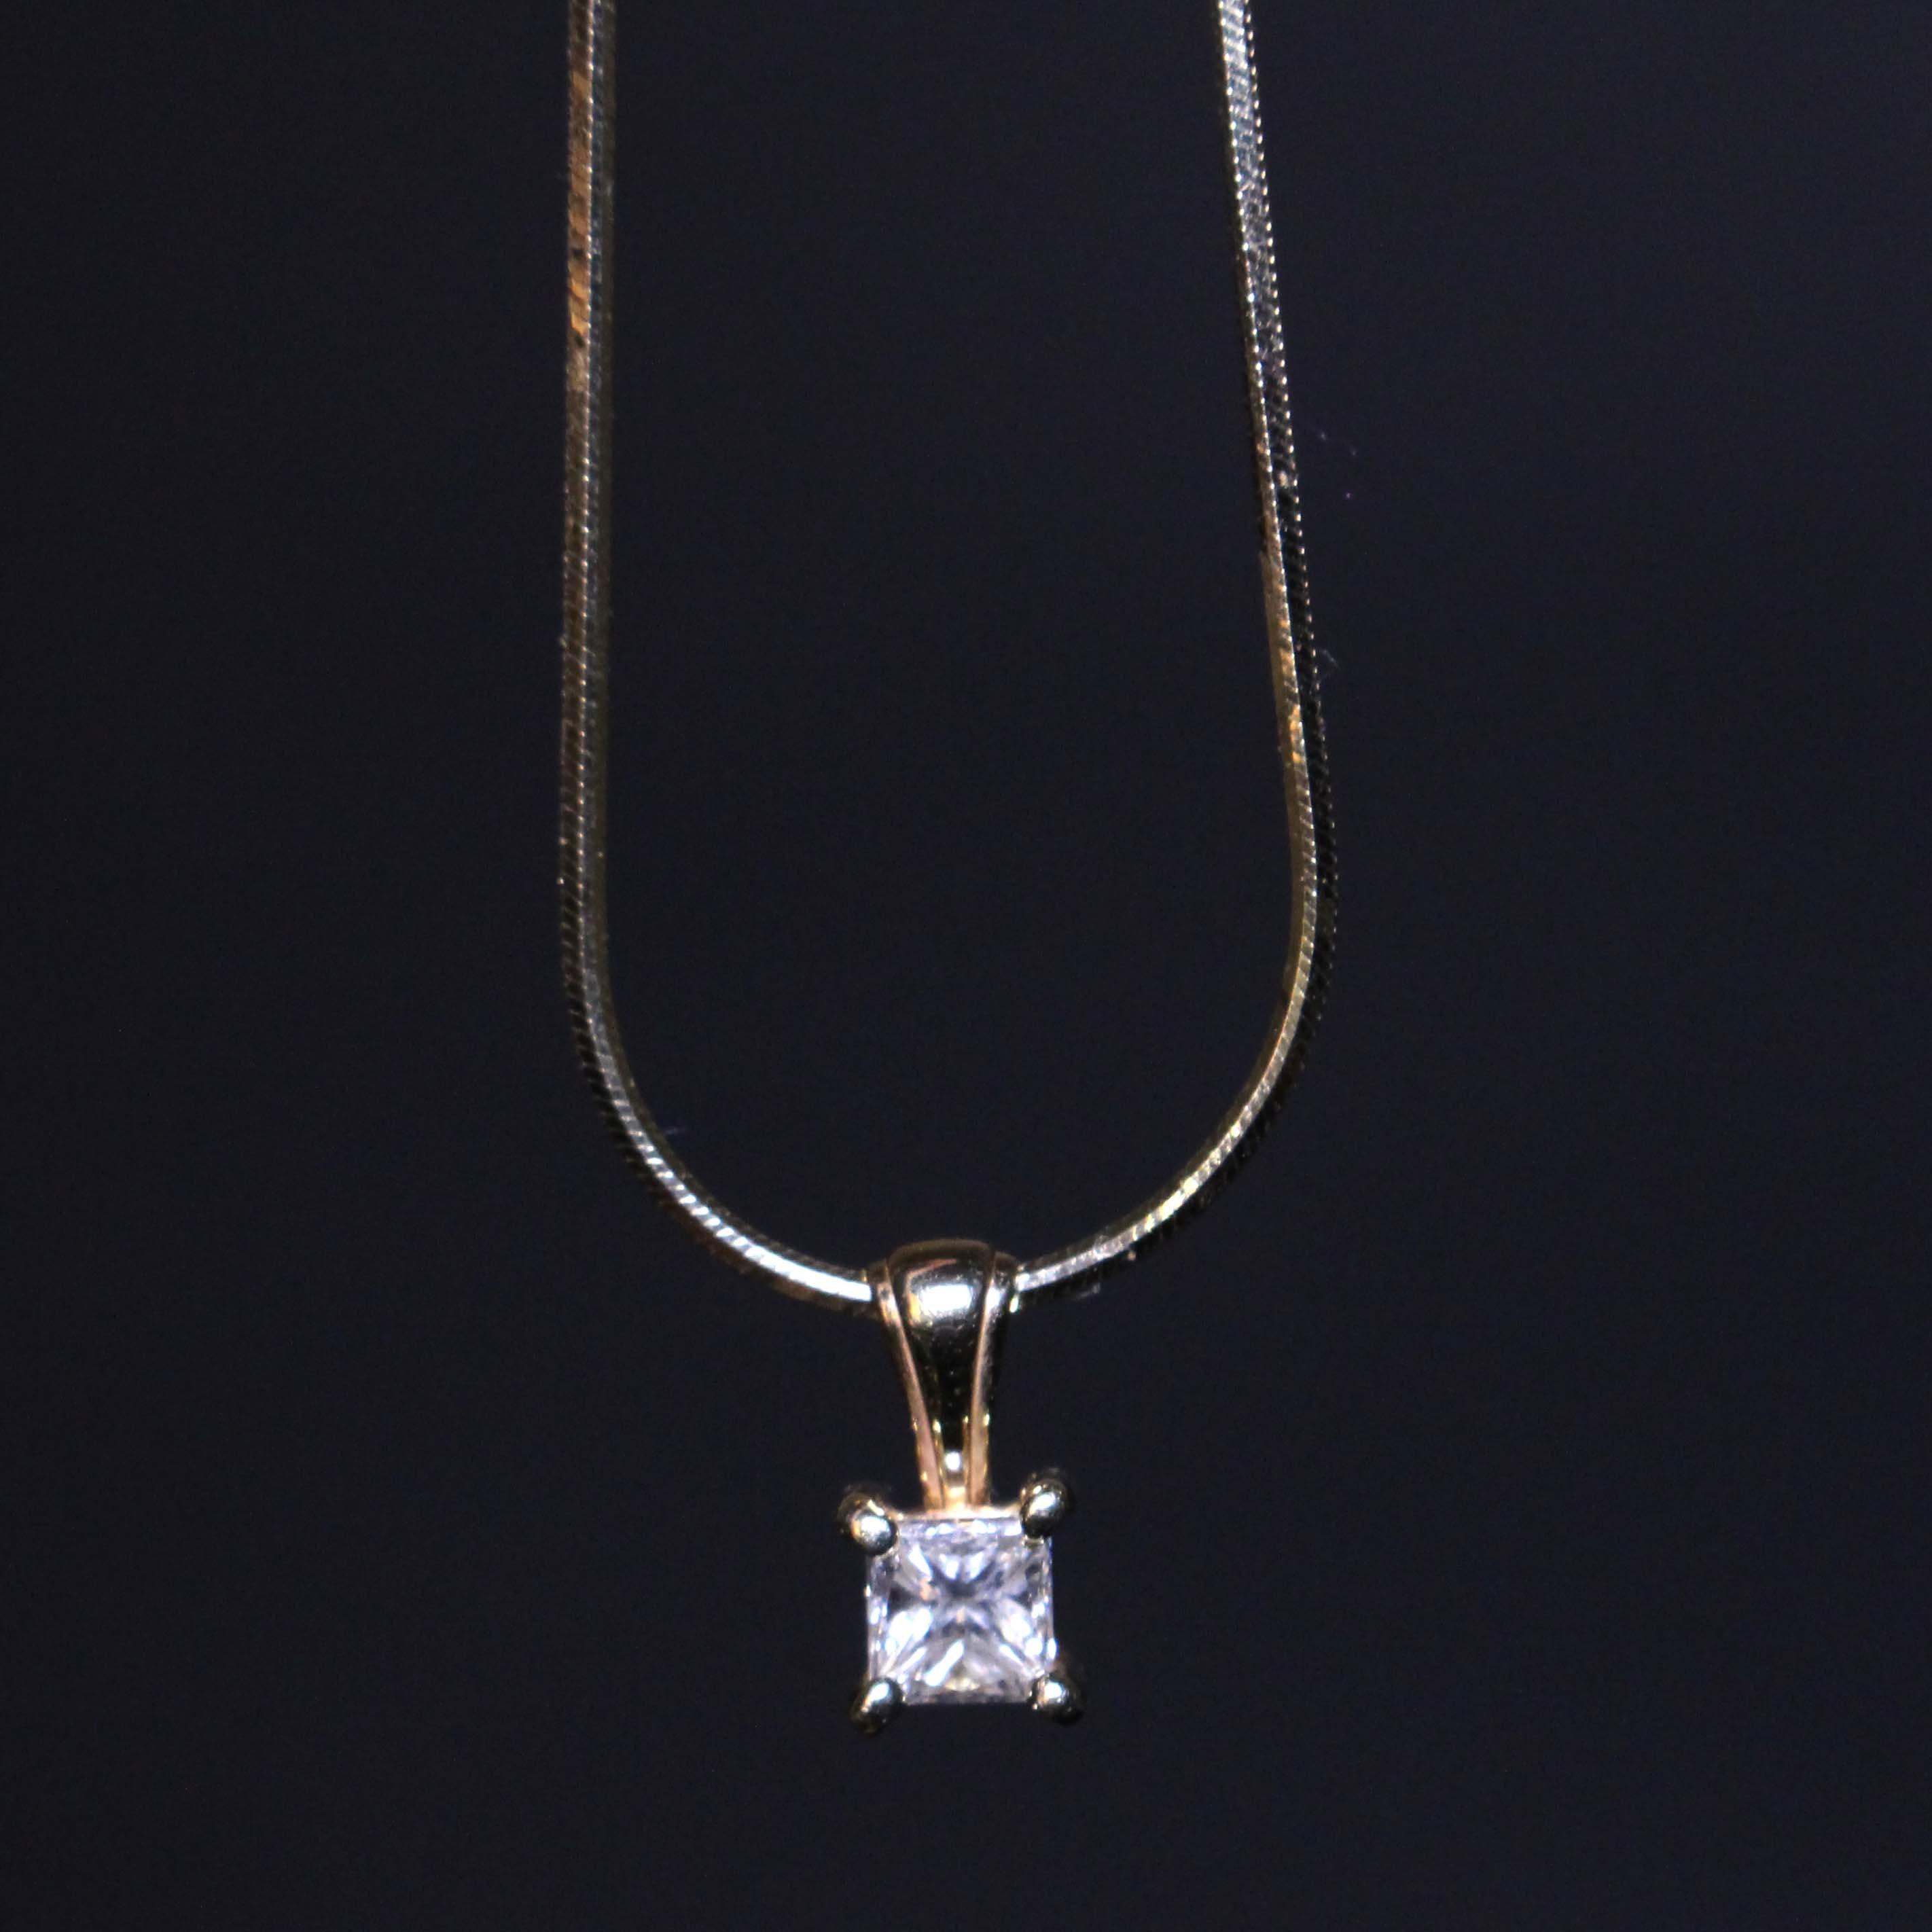 14K Gold Necklace with Diamond Pendant : EBTH